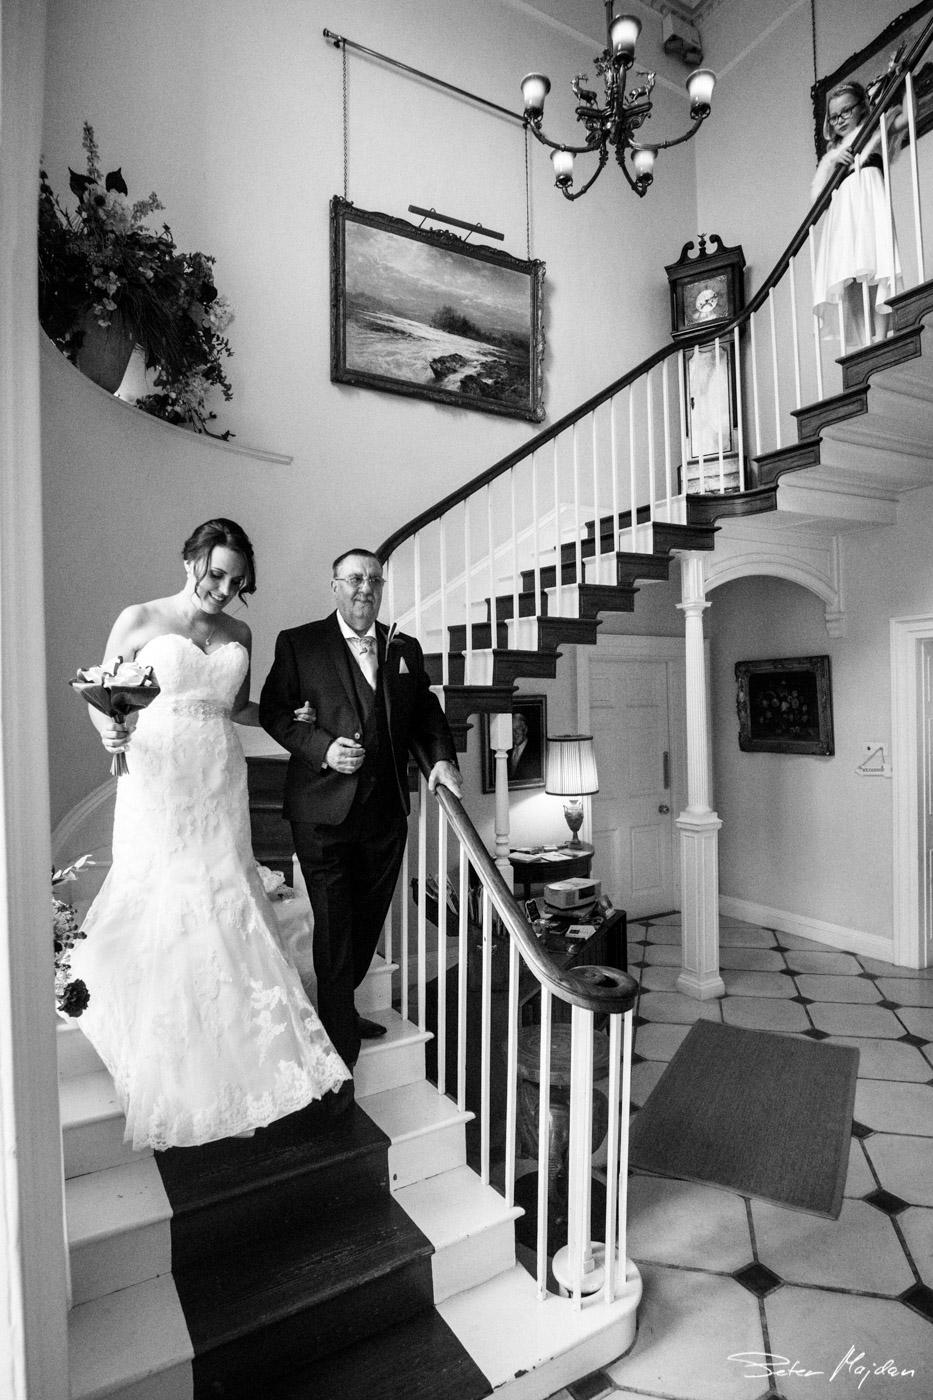 east-bridgford-hill-wedding-photography-24.jpg